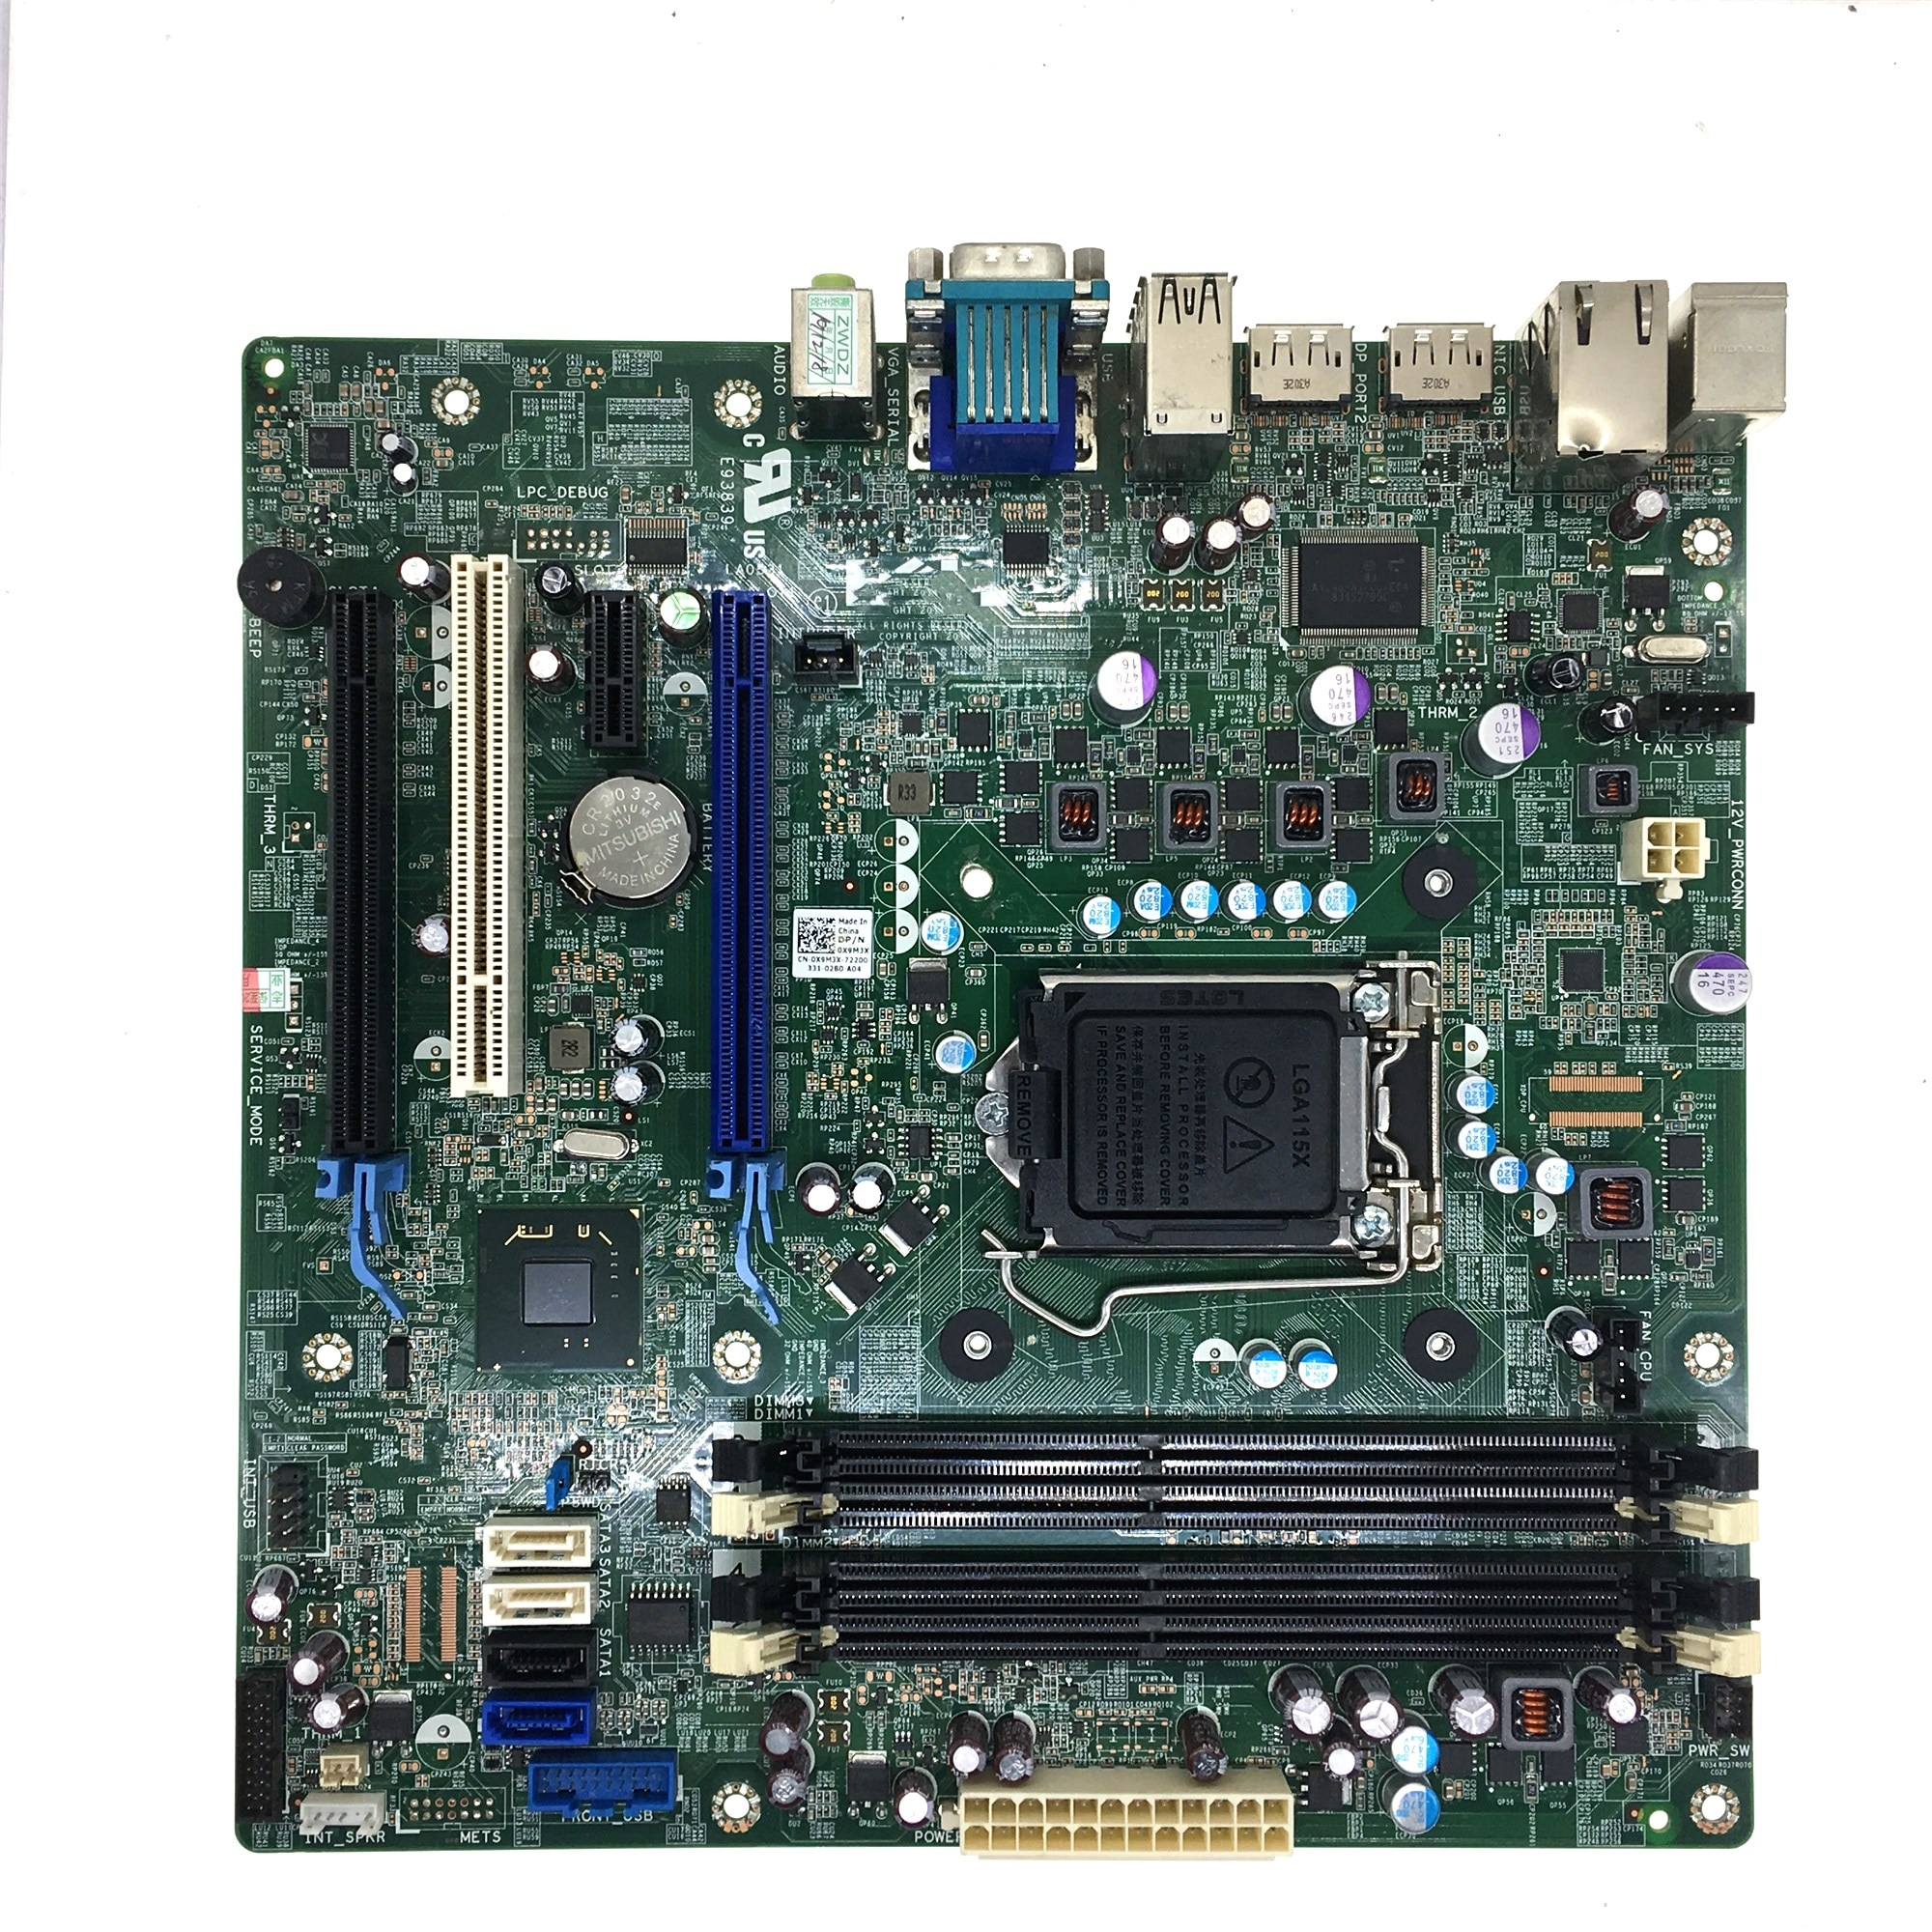 Para Dell OptiPlex 9010 7010 MT DT T1650 DP/N X9M3X J32FG 4M68N 49G3W T3G9D F55GT 773VG GY6Y8 M1RNT YXT71 KV62T motherboard